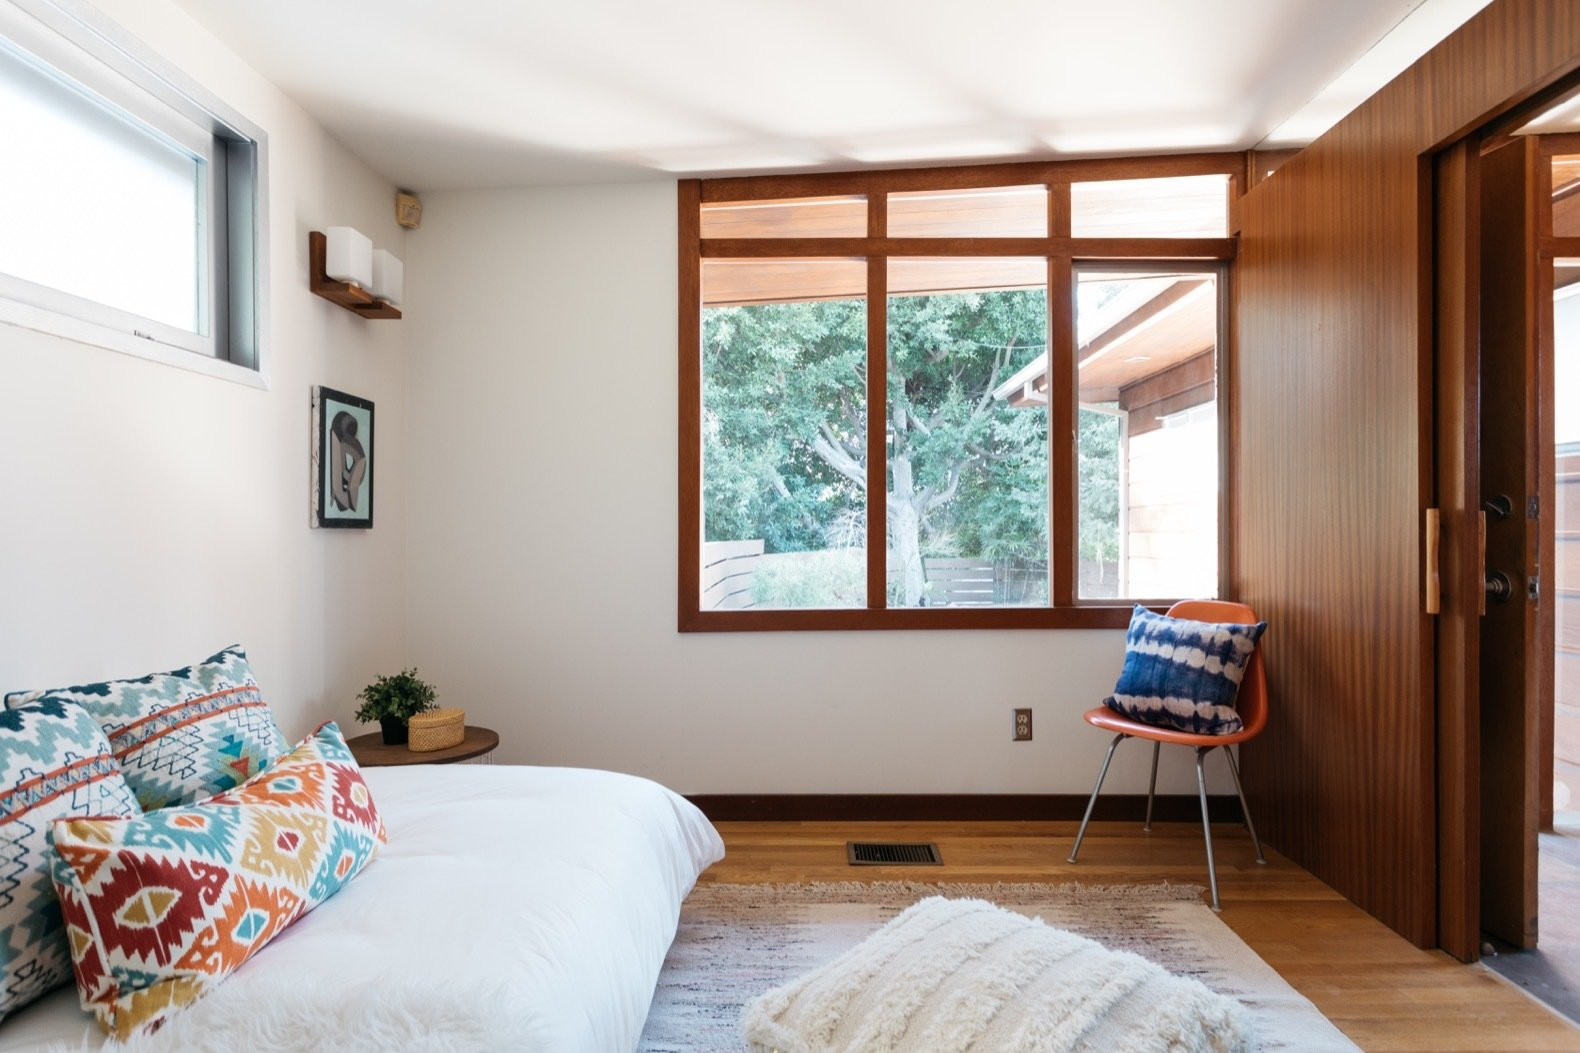 John Kewell Midcentury Home bedroom